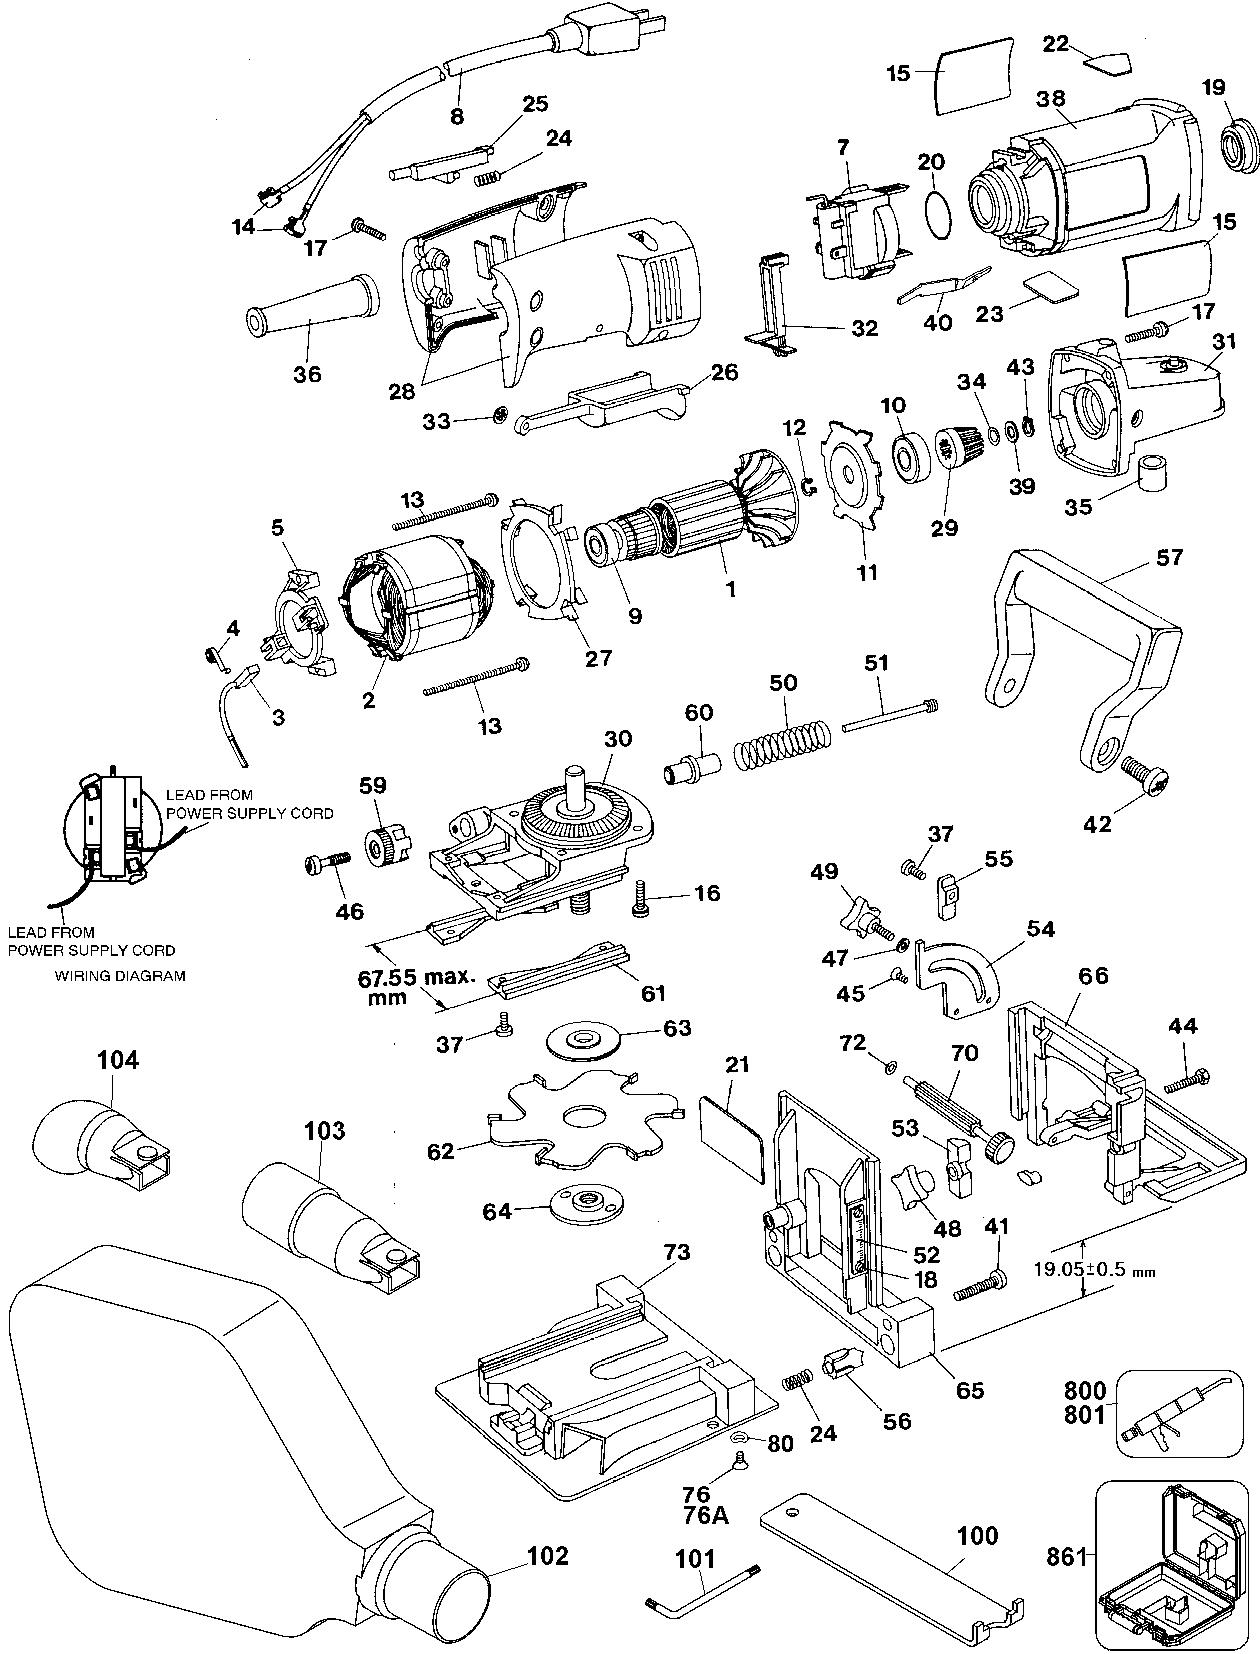 dewalt dw682k plate joiner parts